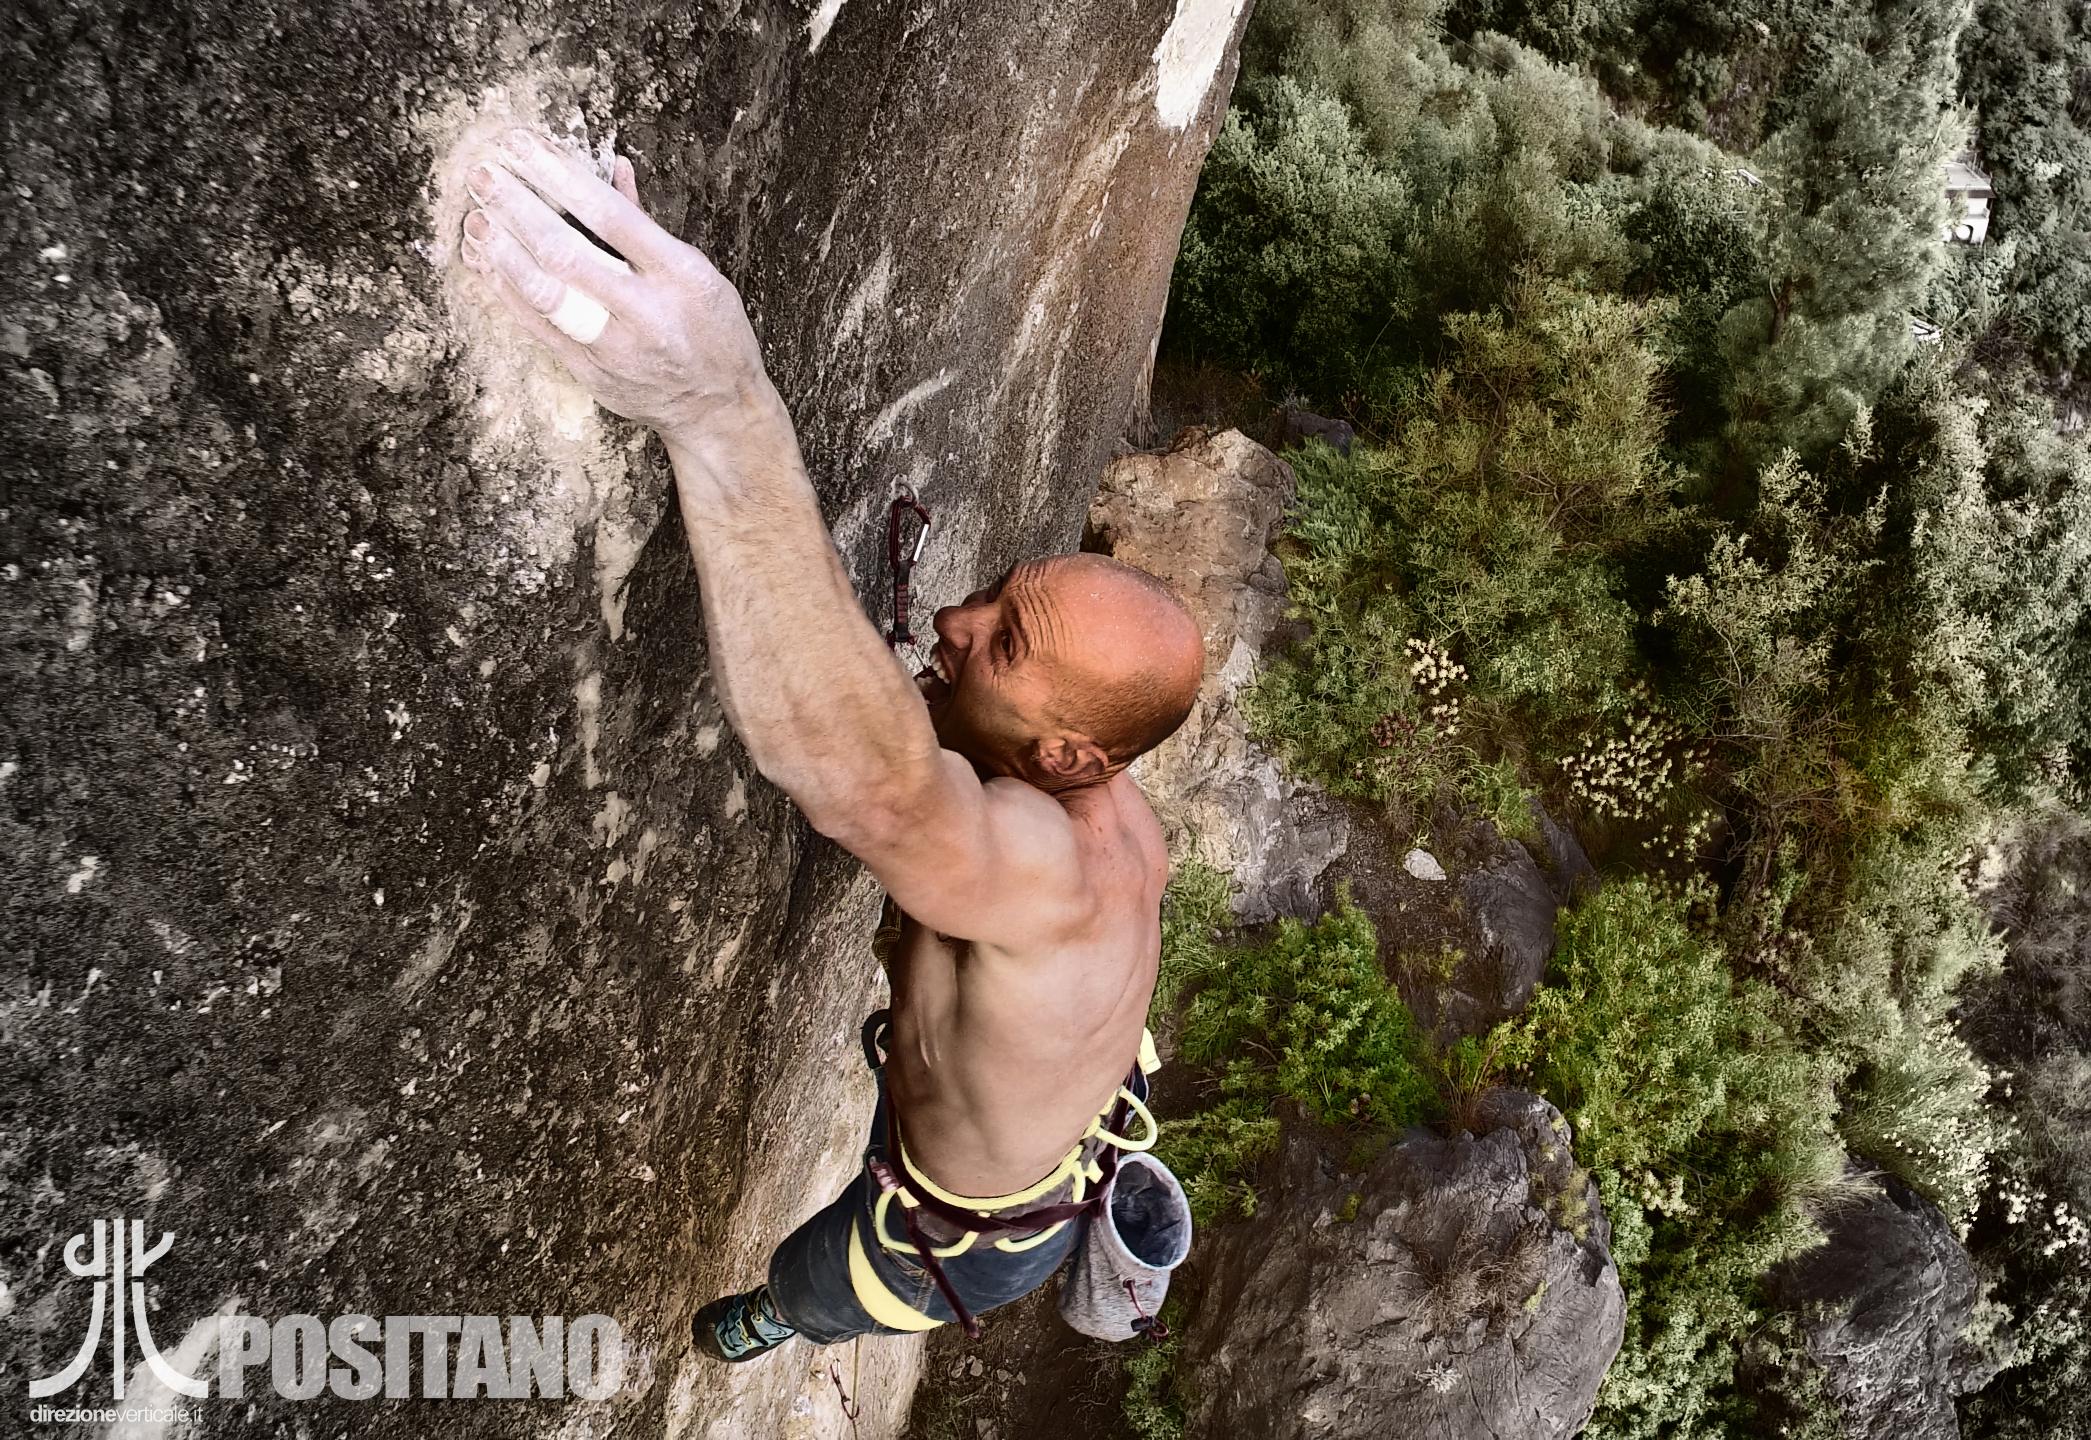 positano climbing stefano perrone guida alpina montagna positano